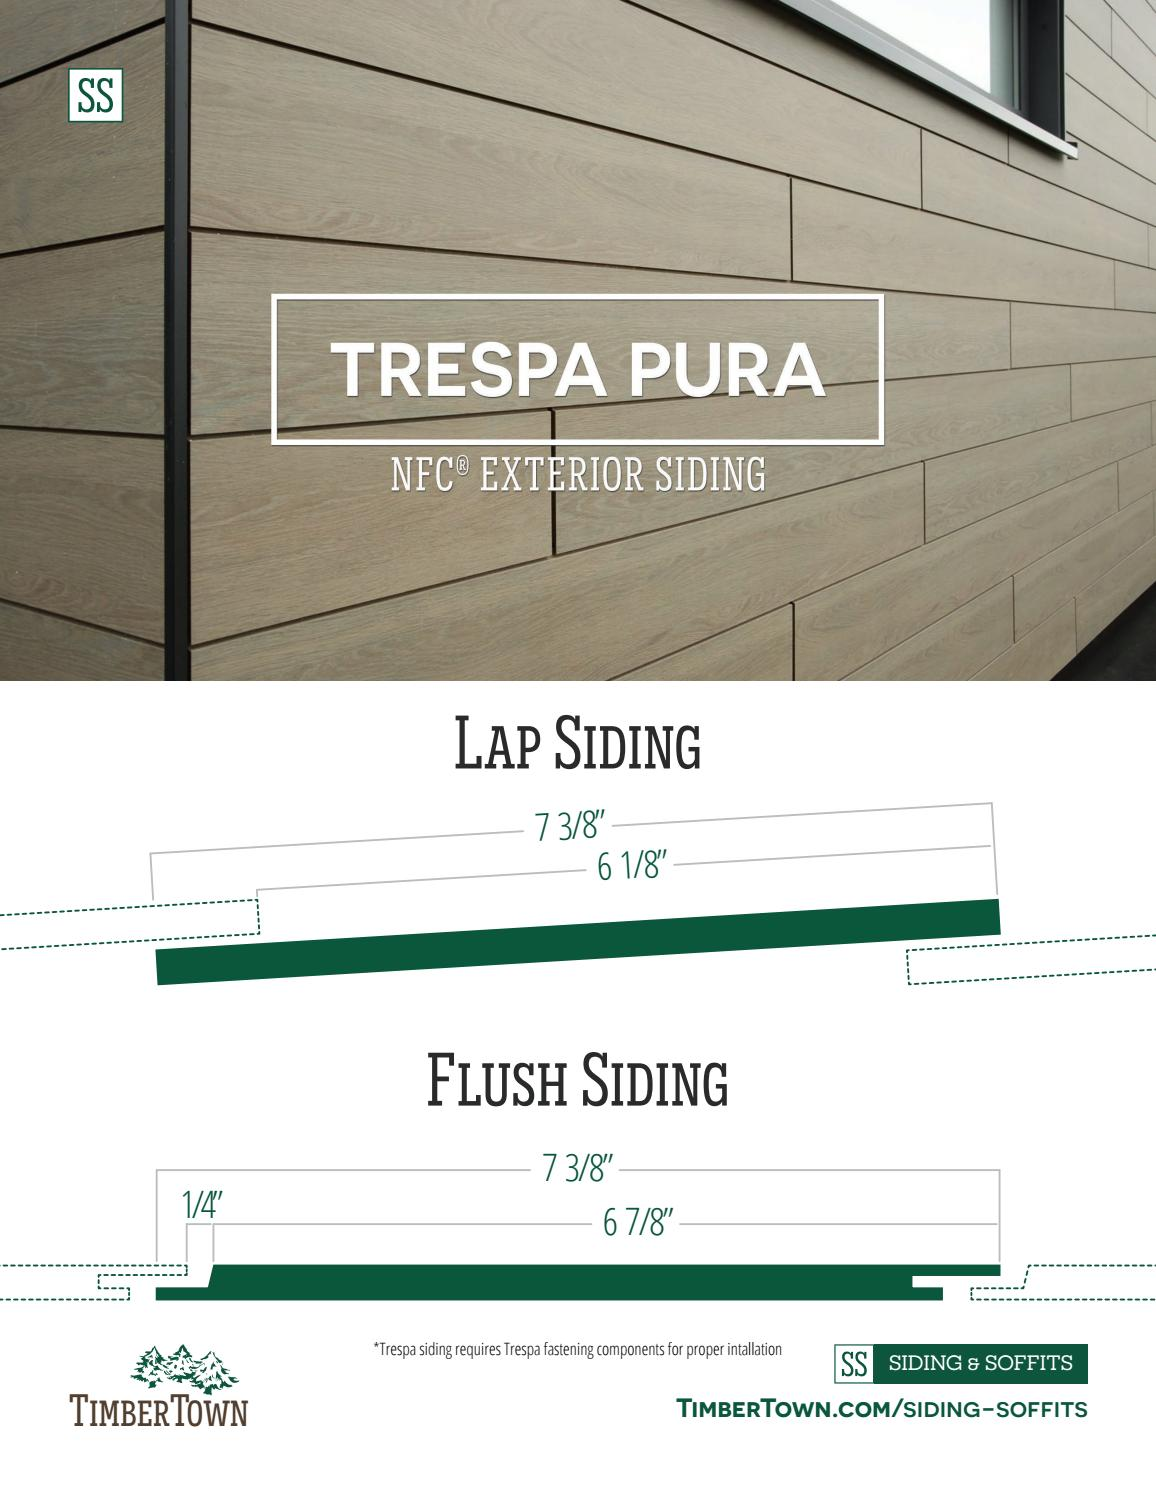 Trespa Pura Nfc Exterior Siding Lap And Flush Profiles